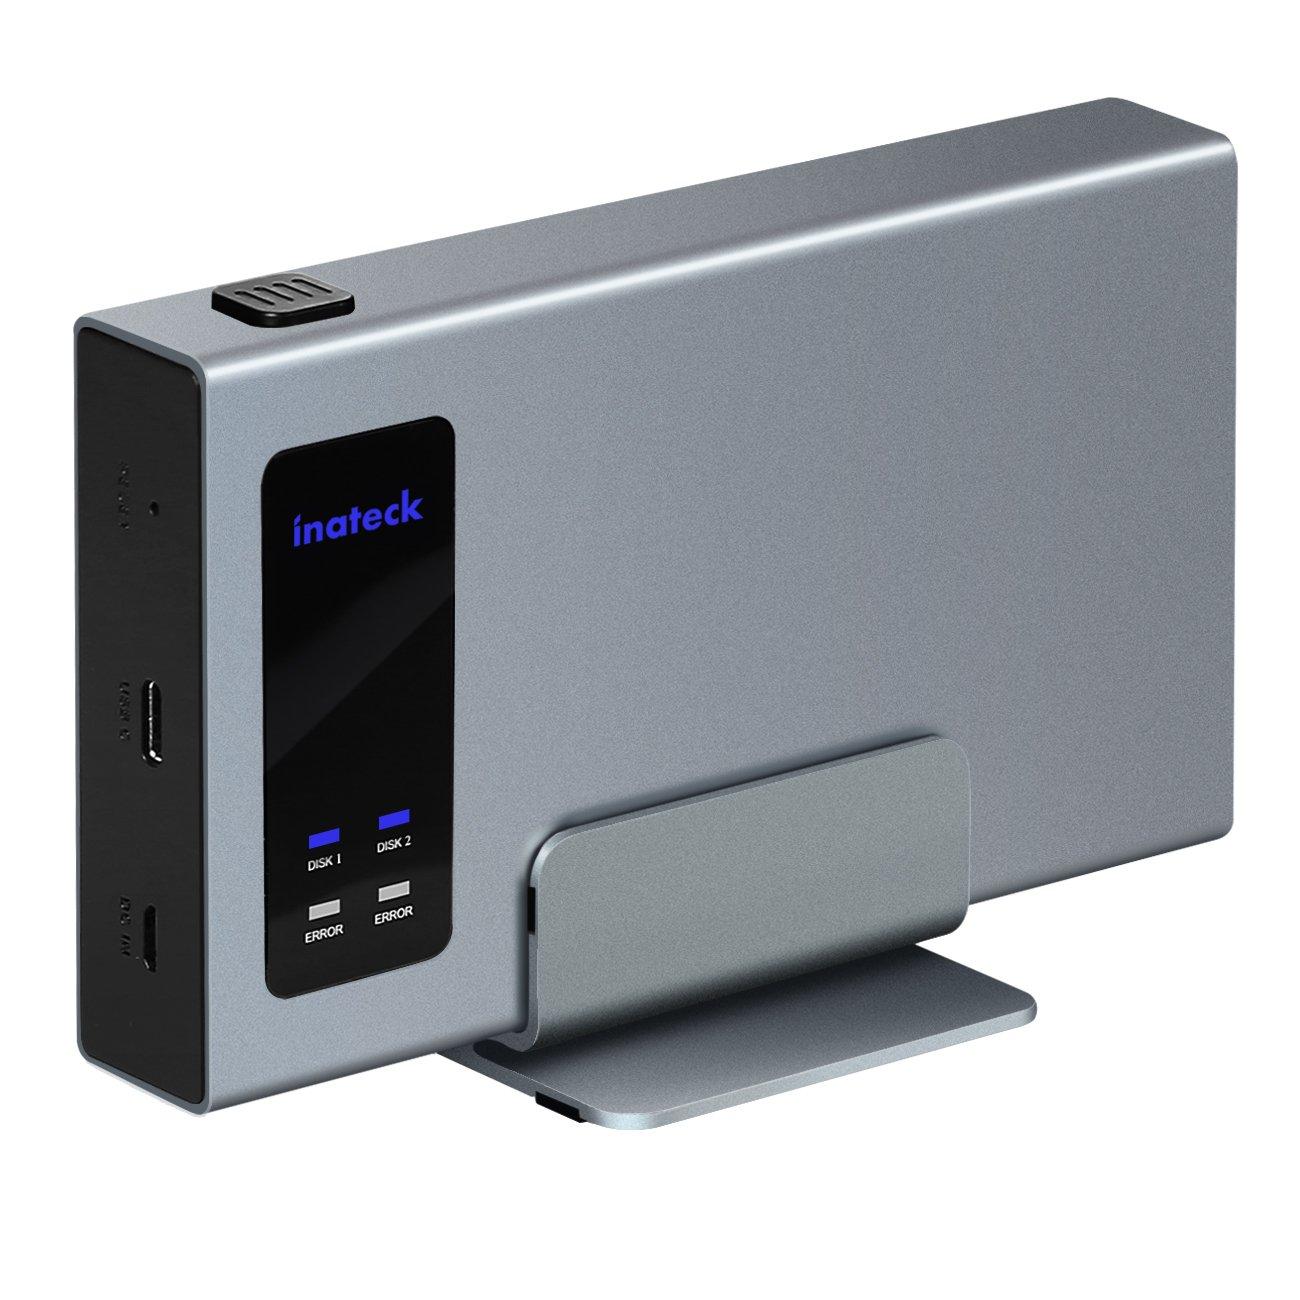 80off Inateck Aluminum Usb C Raid Hdd Enclosure Dual Bay With A Avaya 4620 5620 Circuit Board Portable